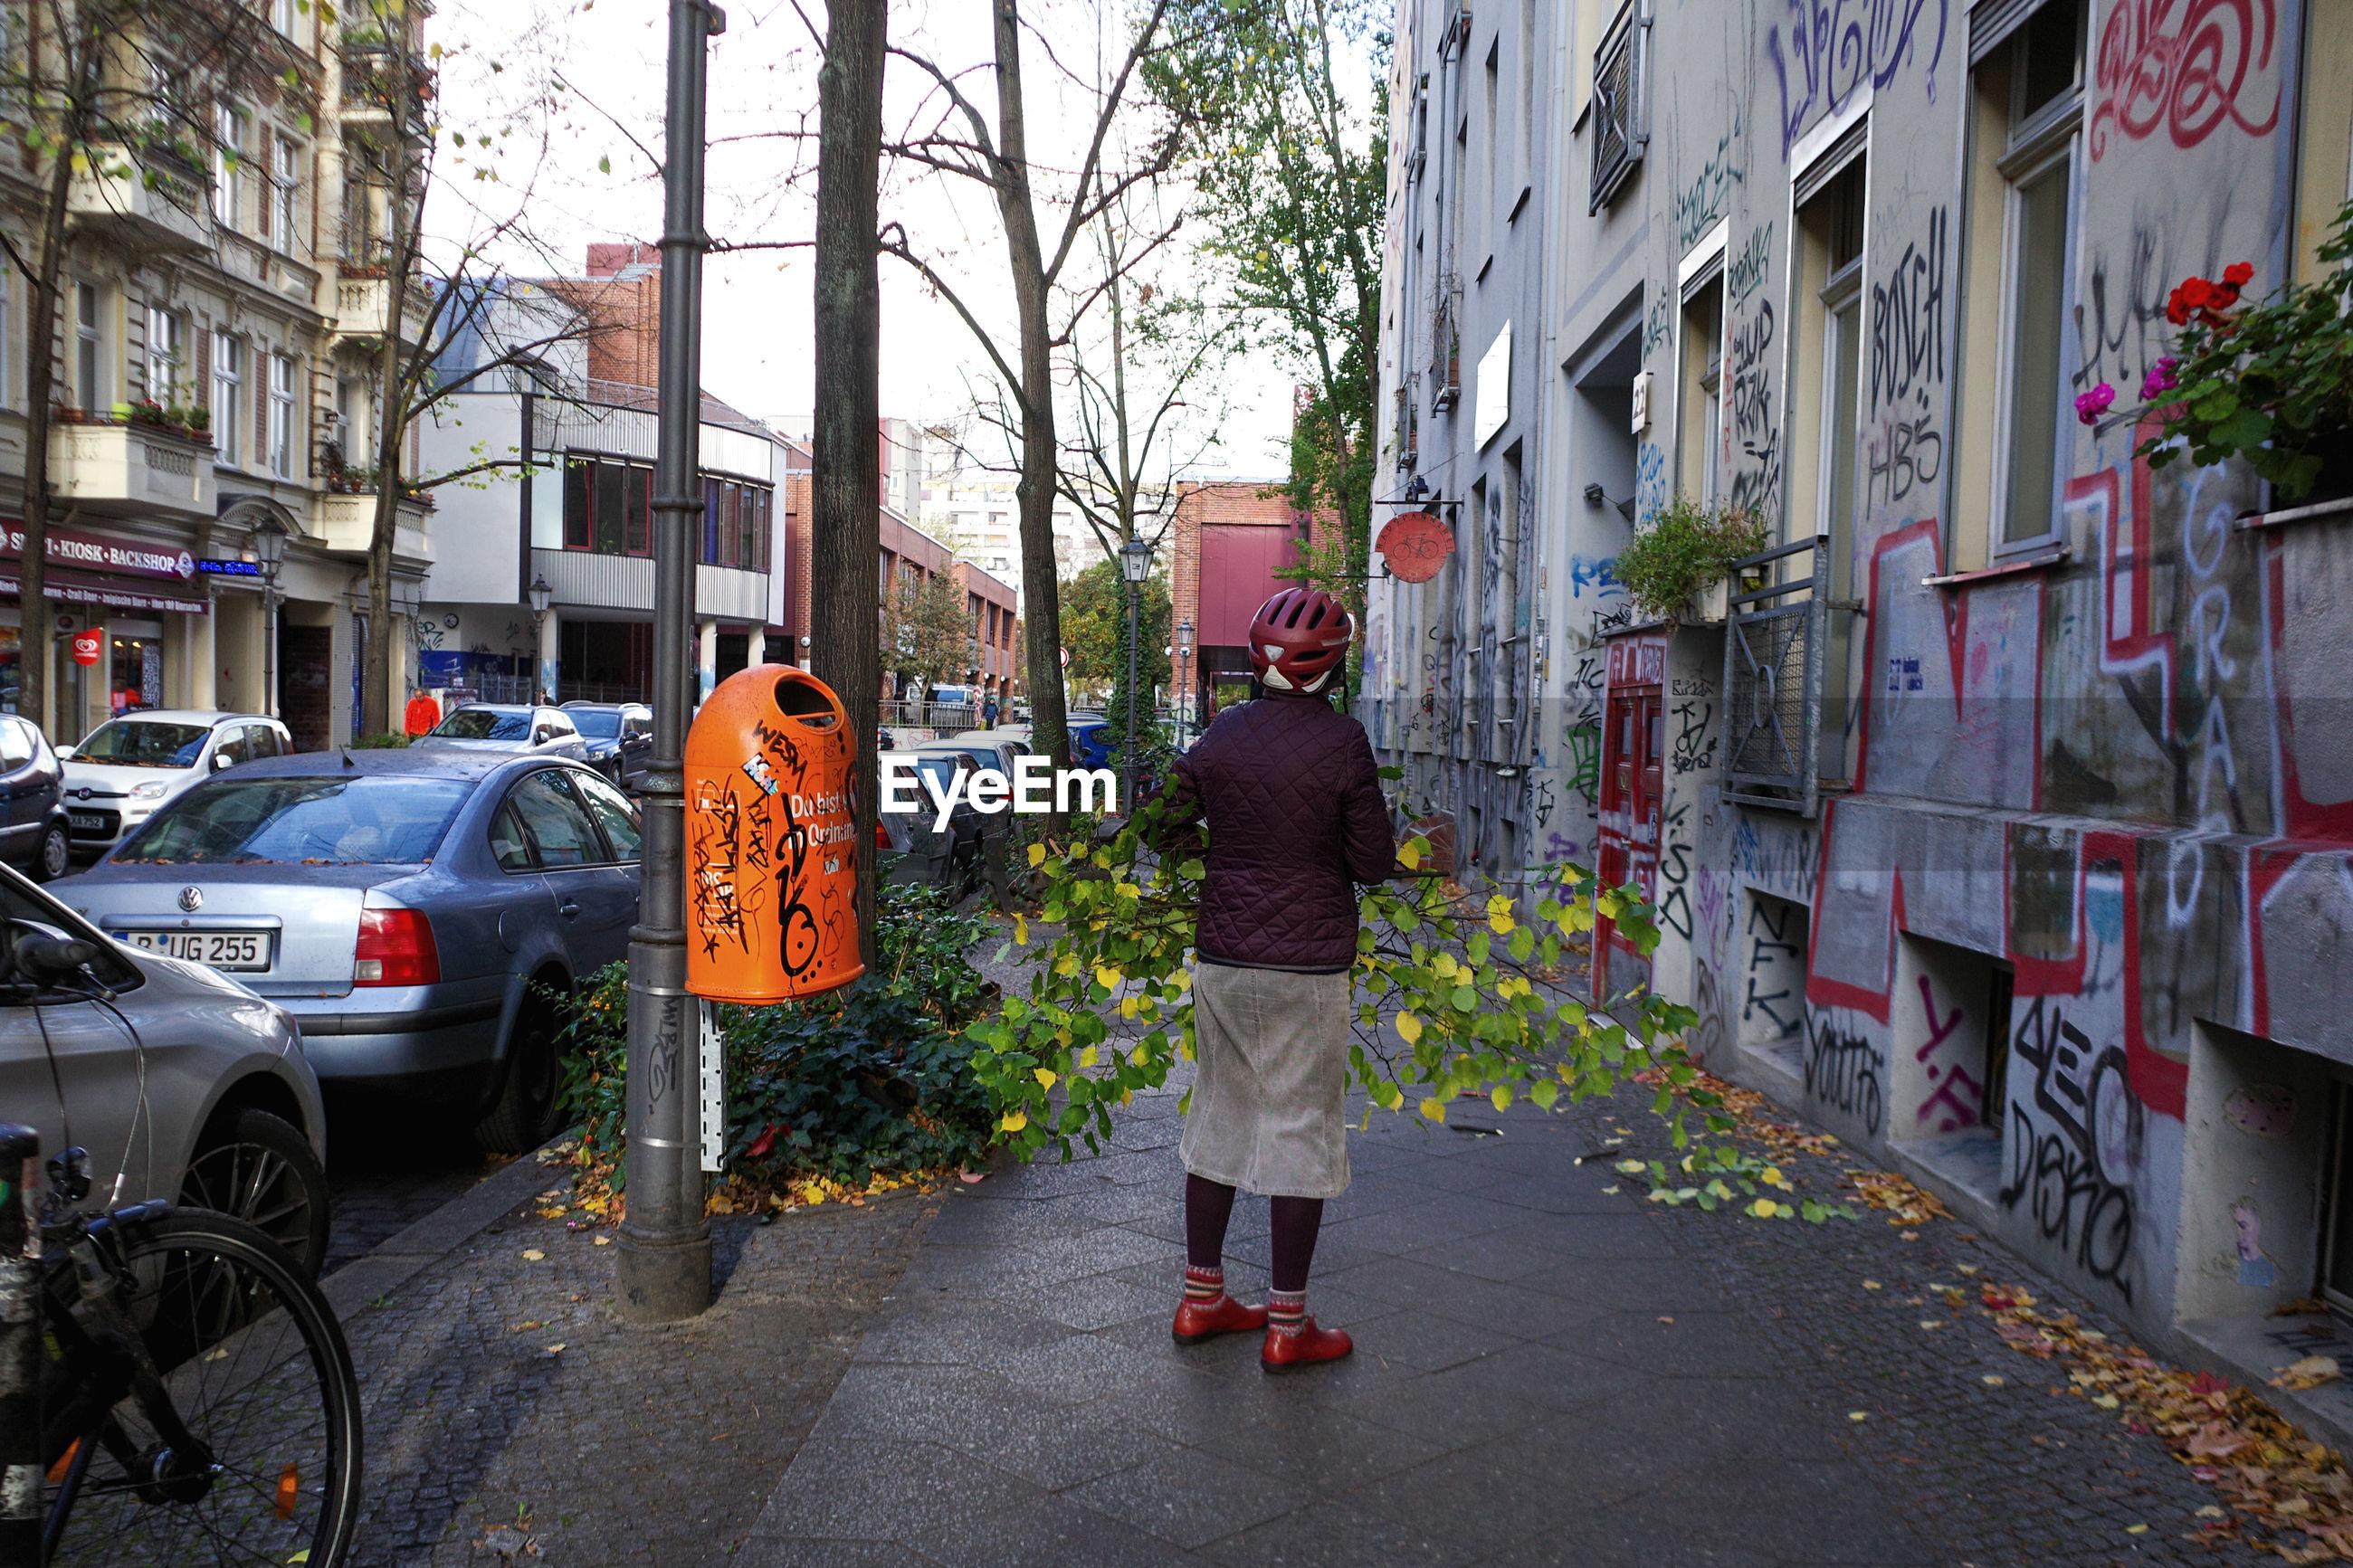 REAR VIEW OF MAN WALKING ON STREET AMIDST CITY